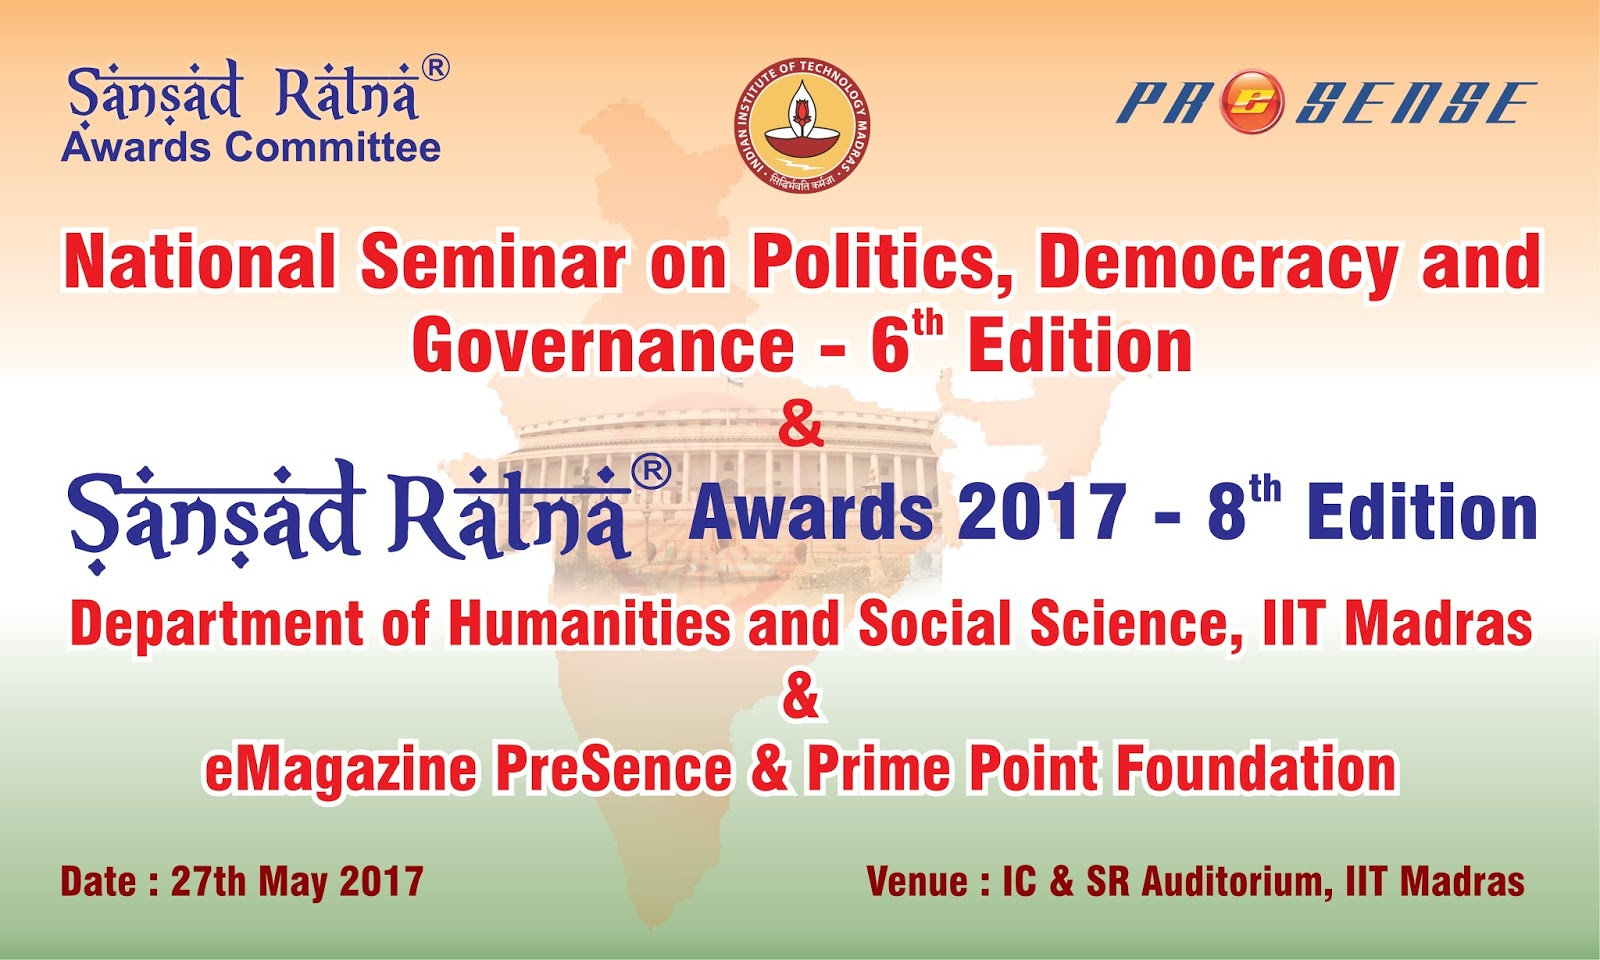 Sansad Ratna 2017 event photos, press matters and live streaming